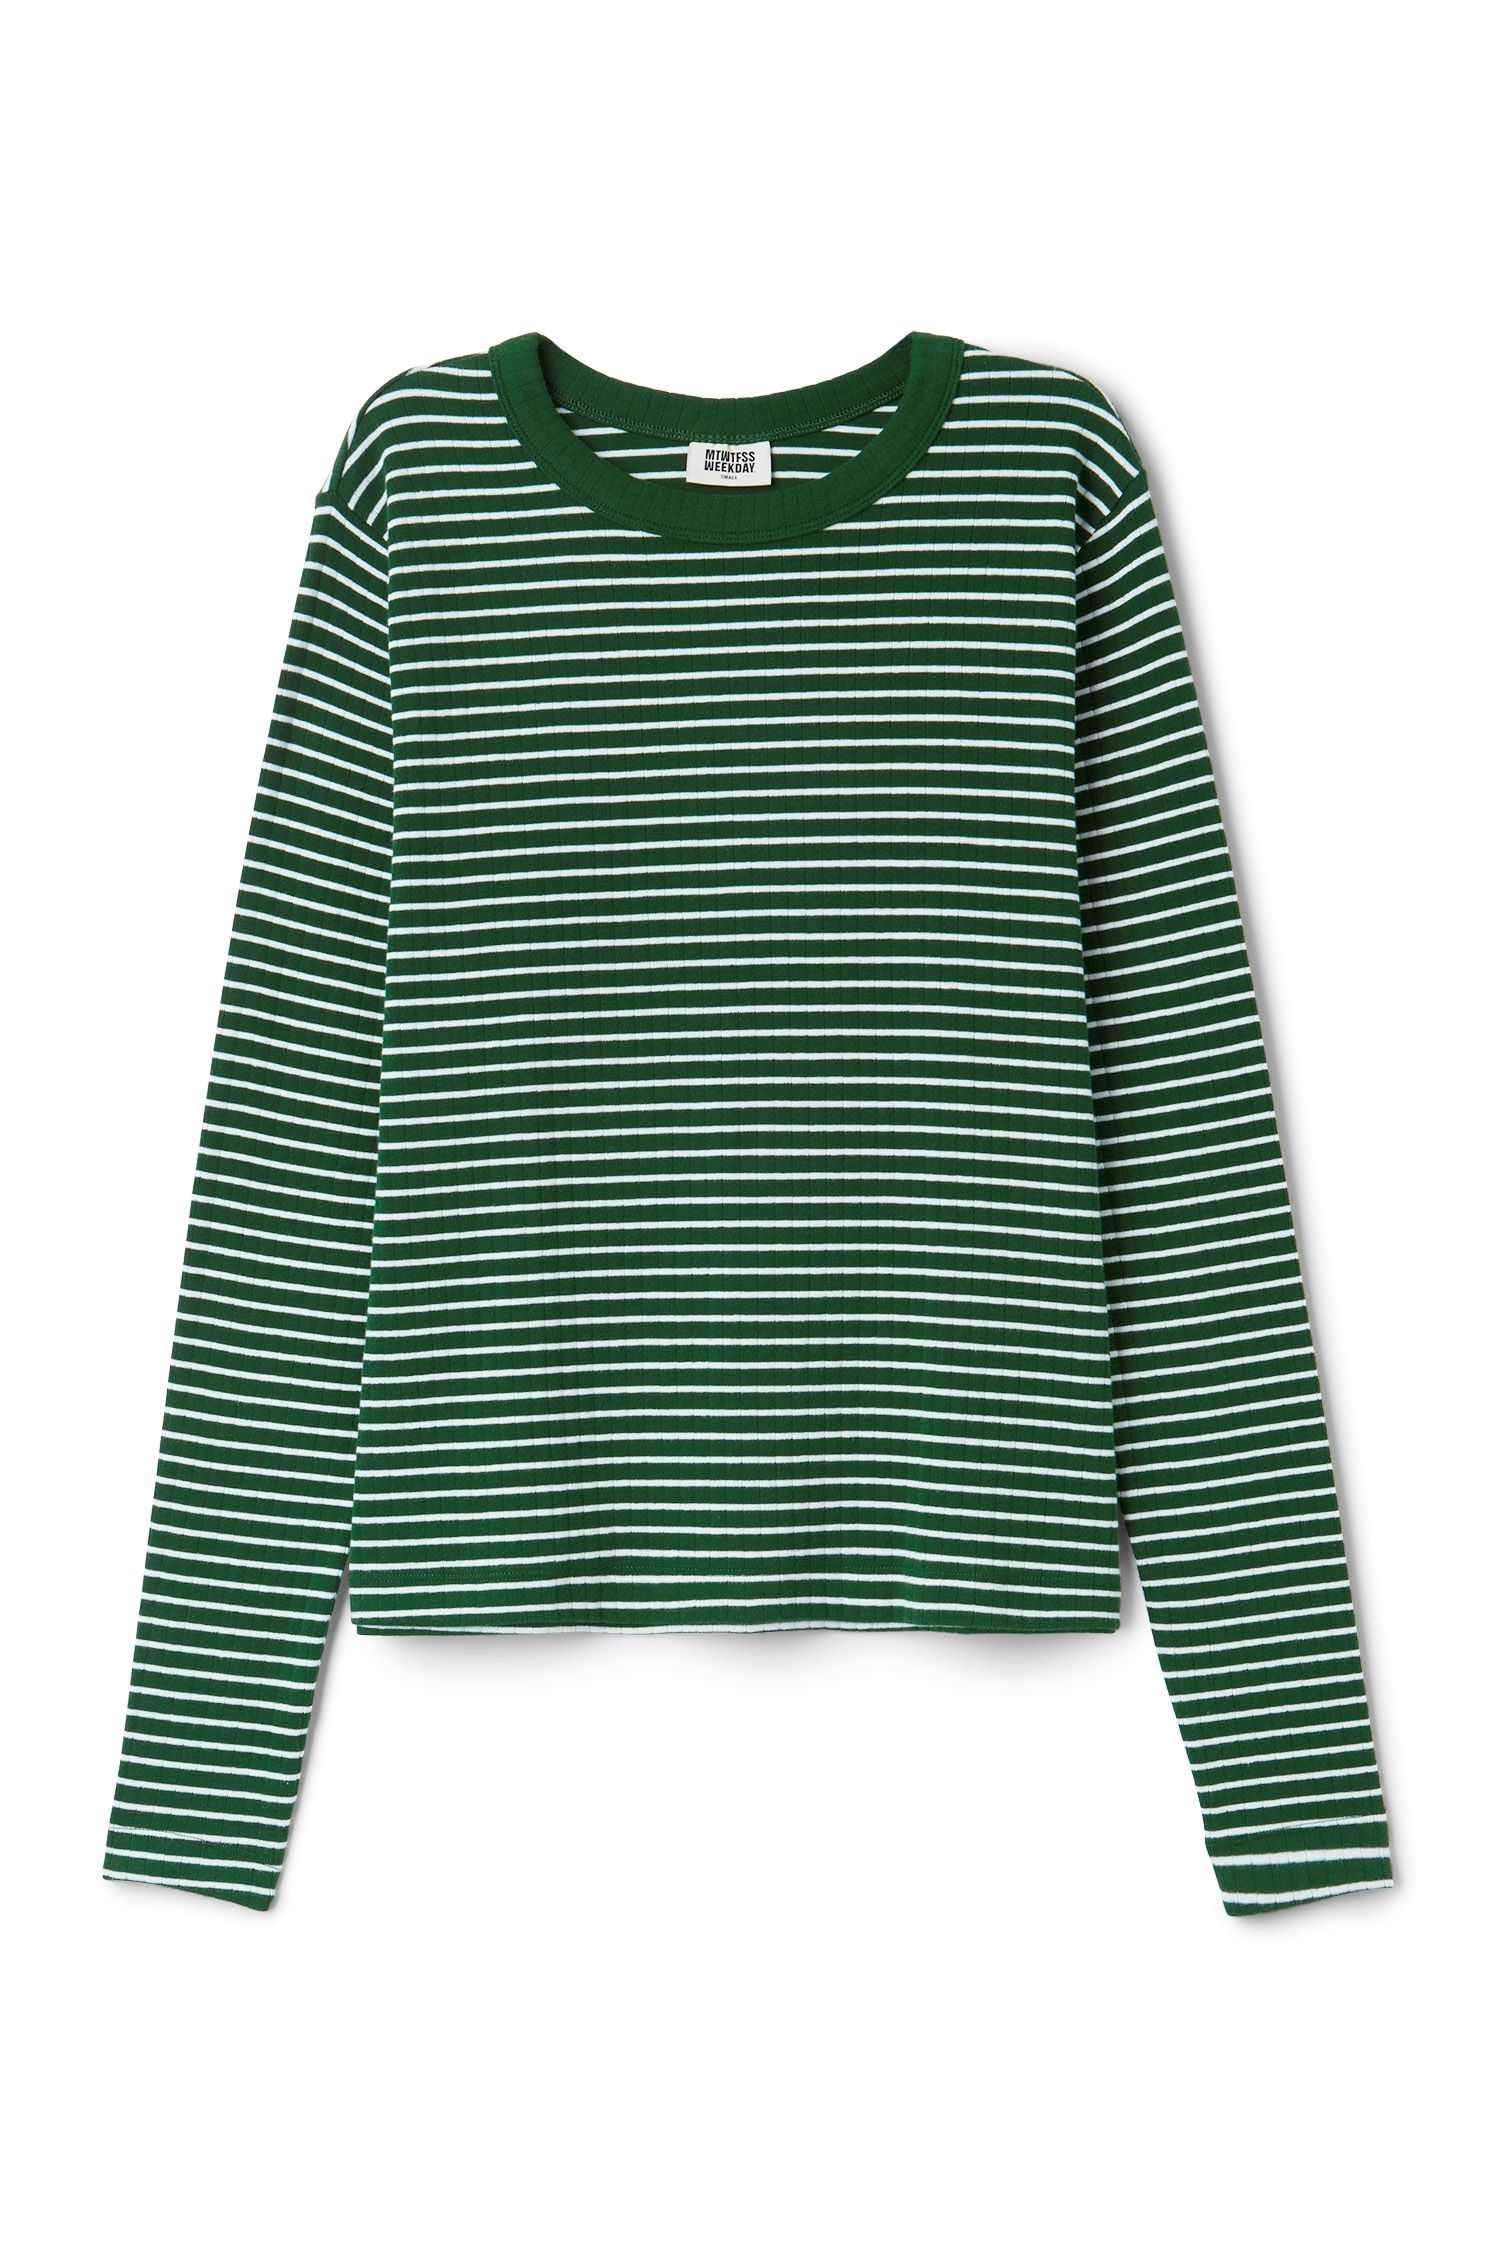 Weekday Image 4 Of Stripe Long Sleeve T Shirt In Green Dark Striped Long Sleeve Shirt Aesthetic Shirts Striped Long Sleeve